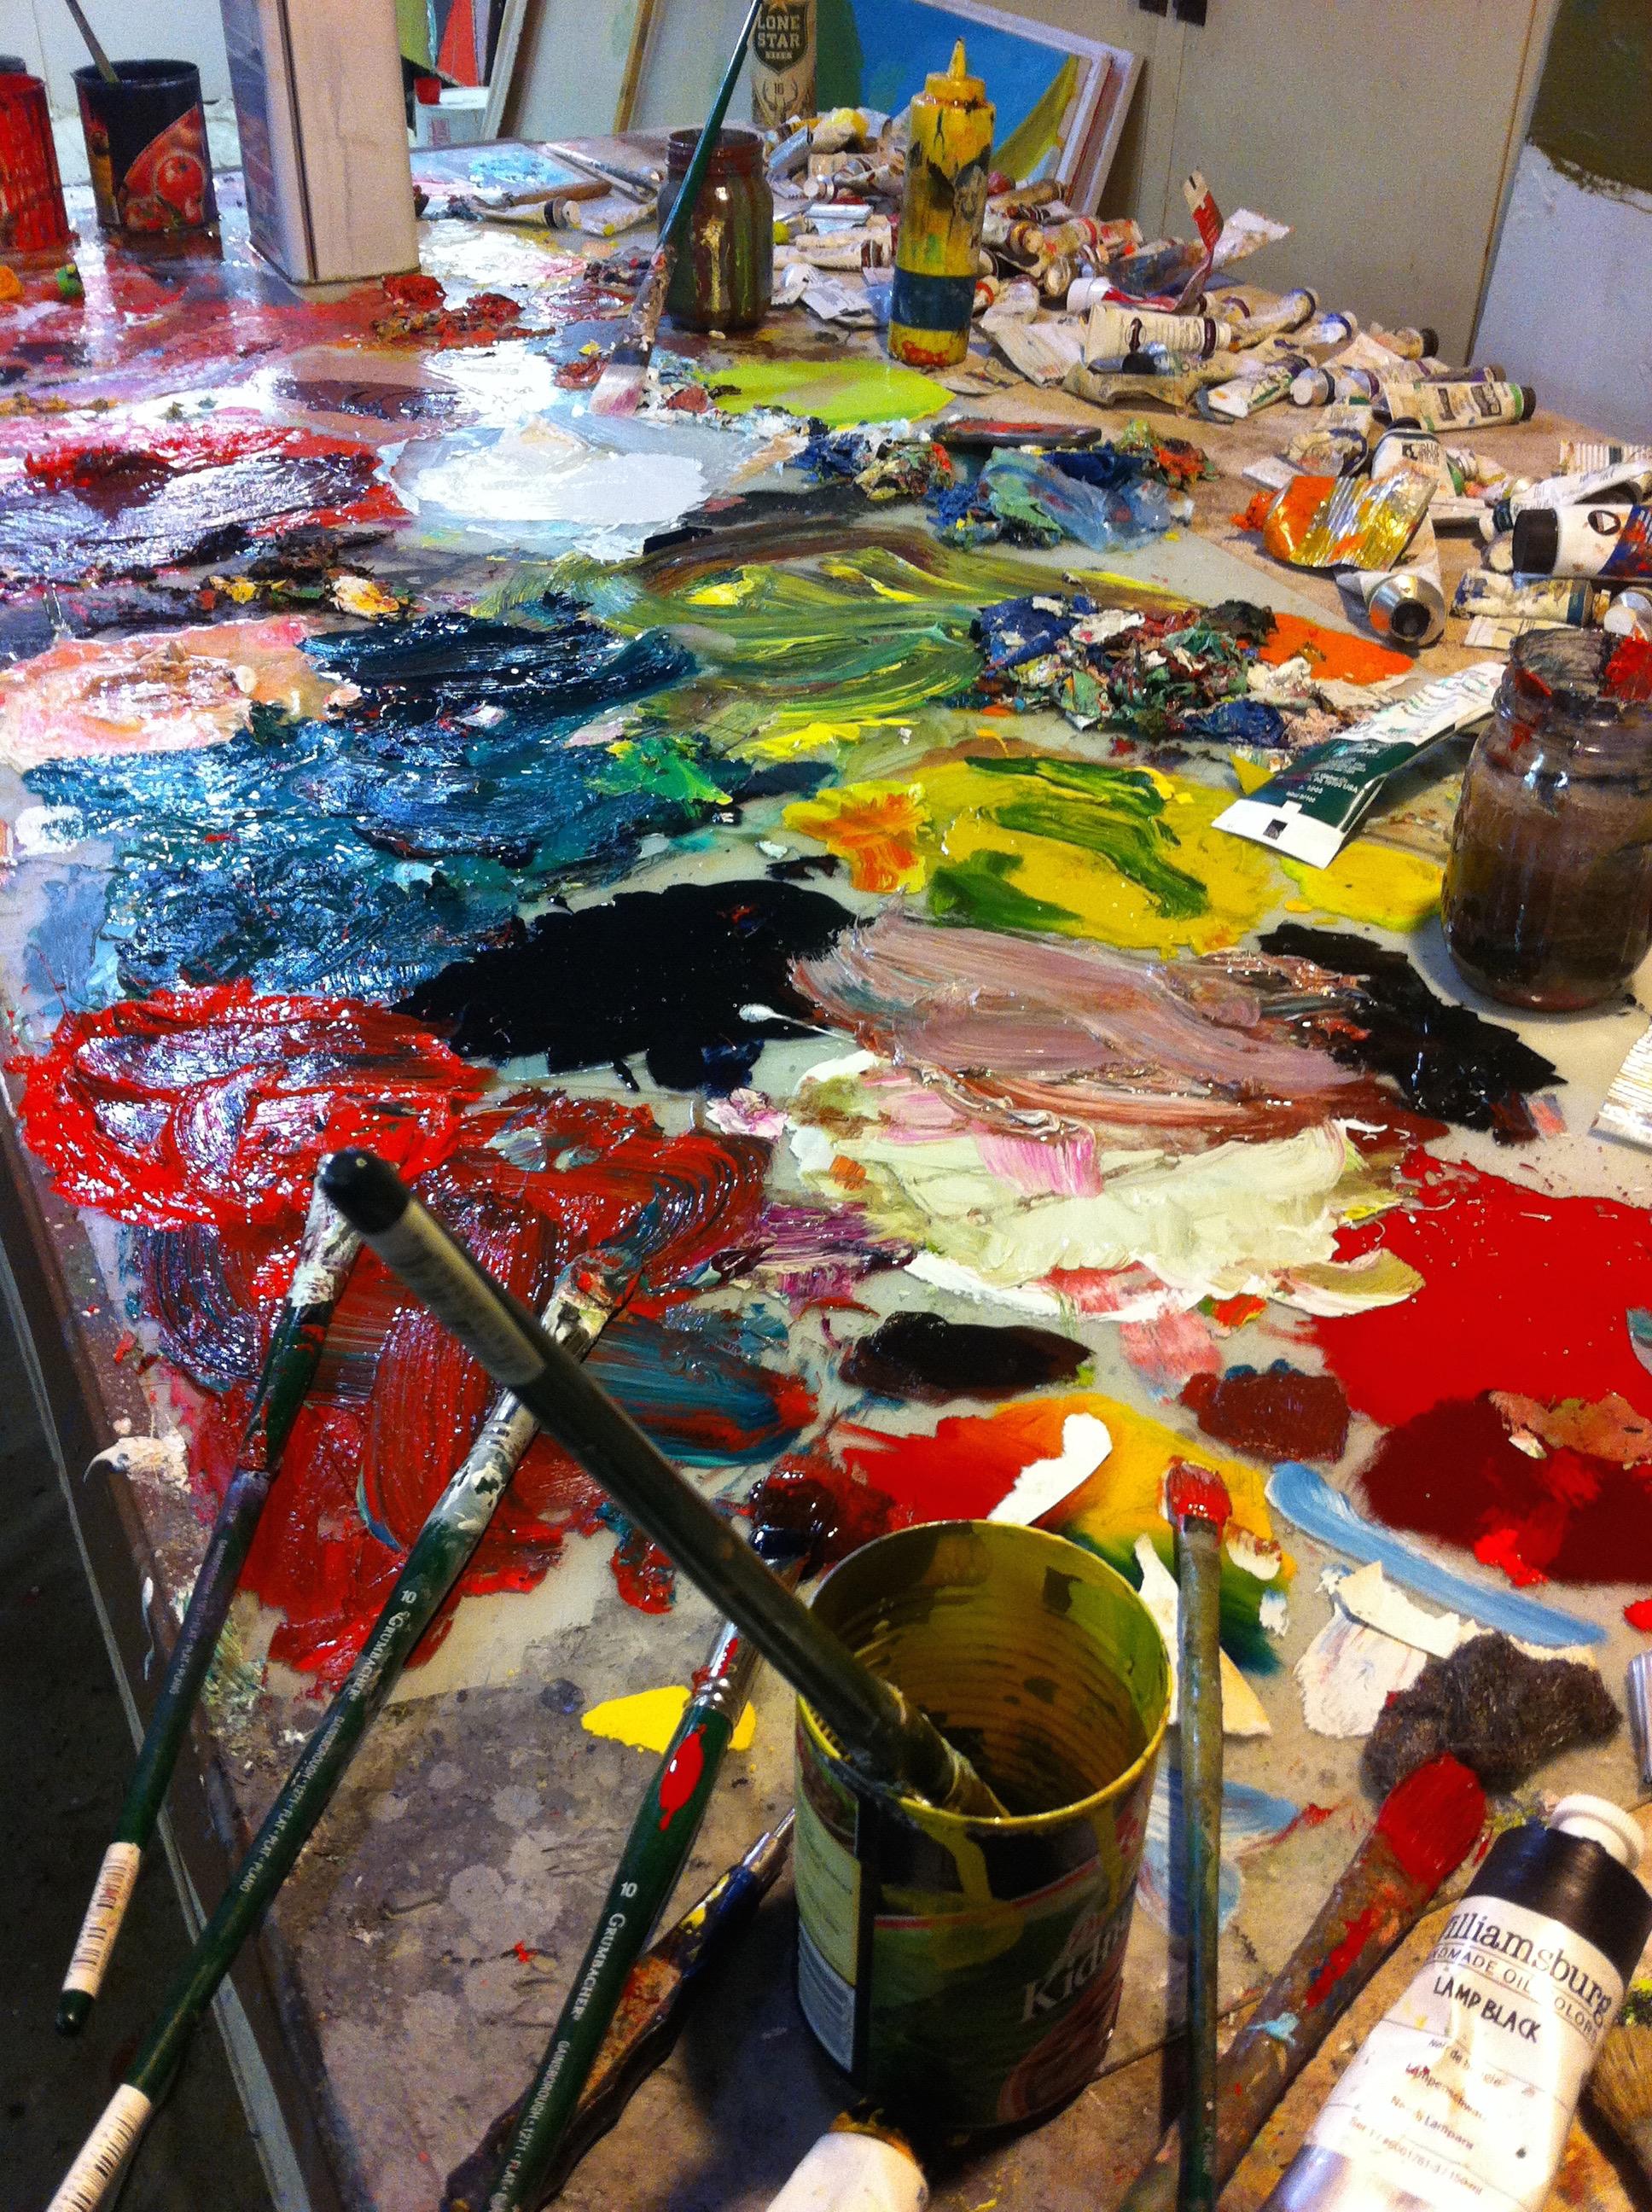 An artist's studio in Marfa, TX